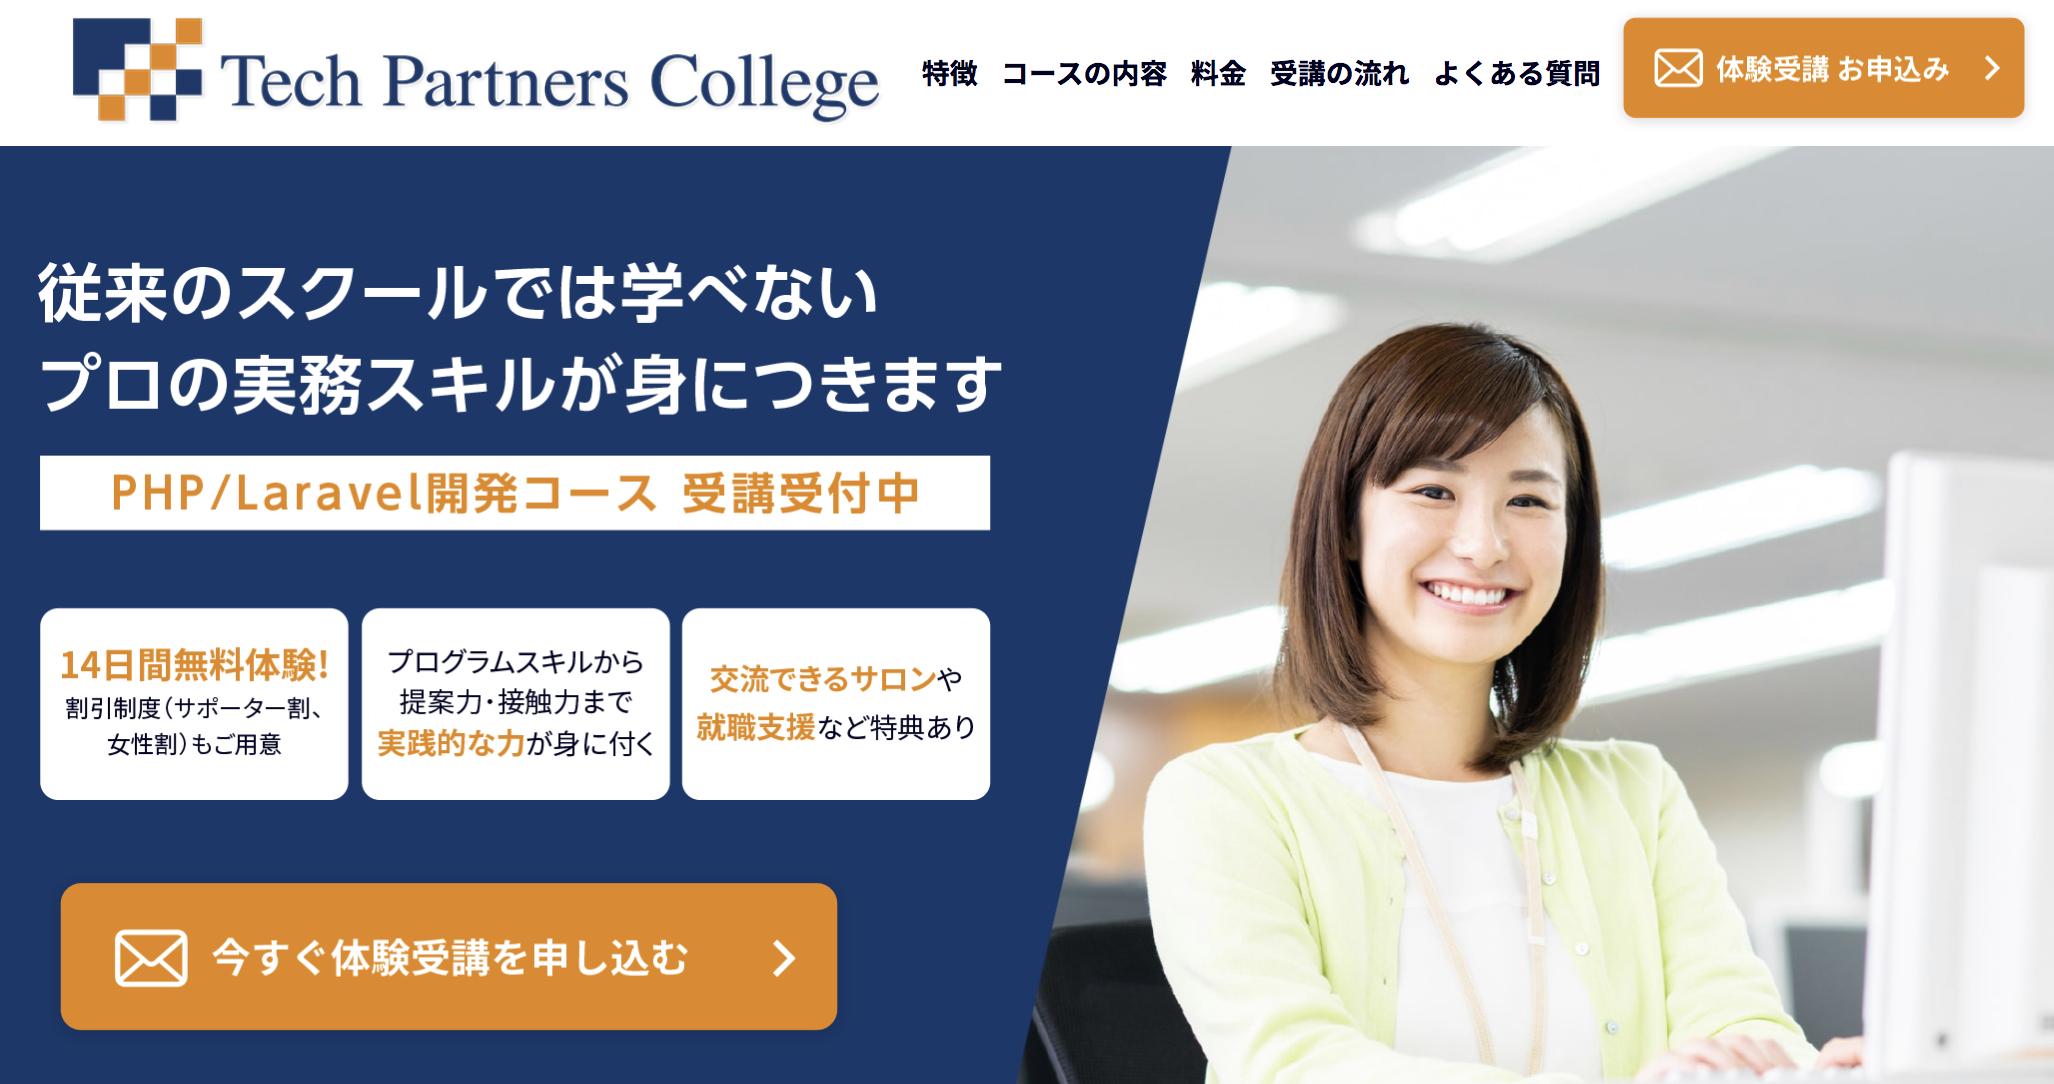 TechPartnersCollege(テックパートナーズカレッジ)